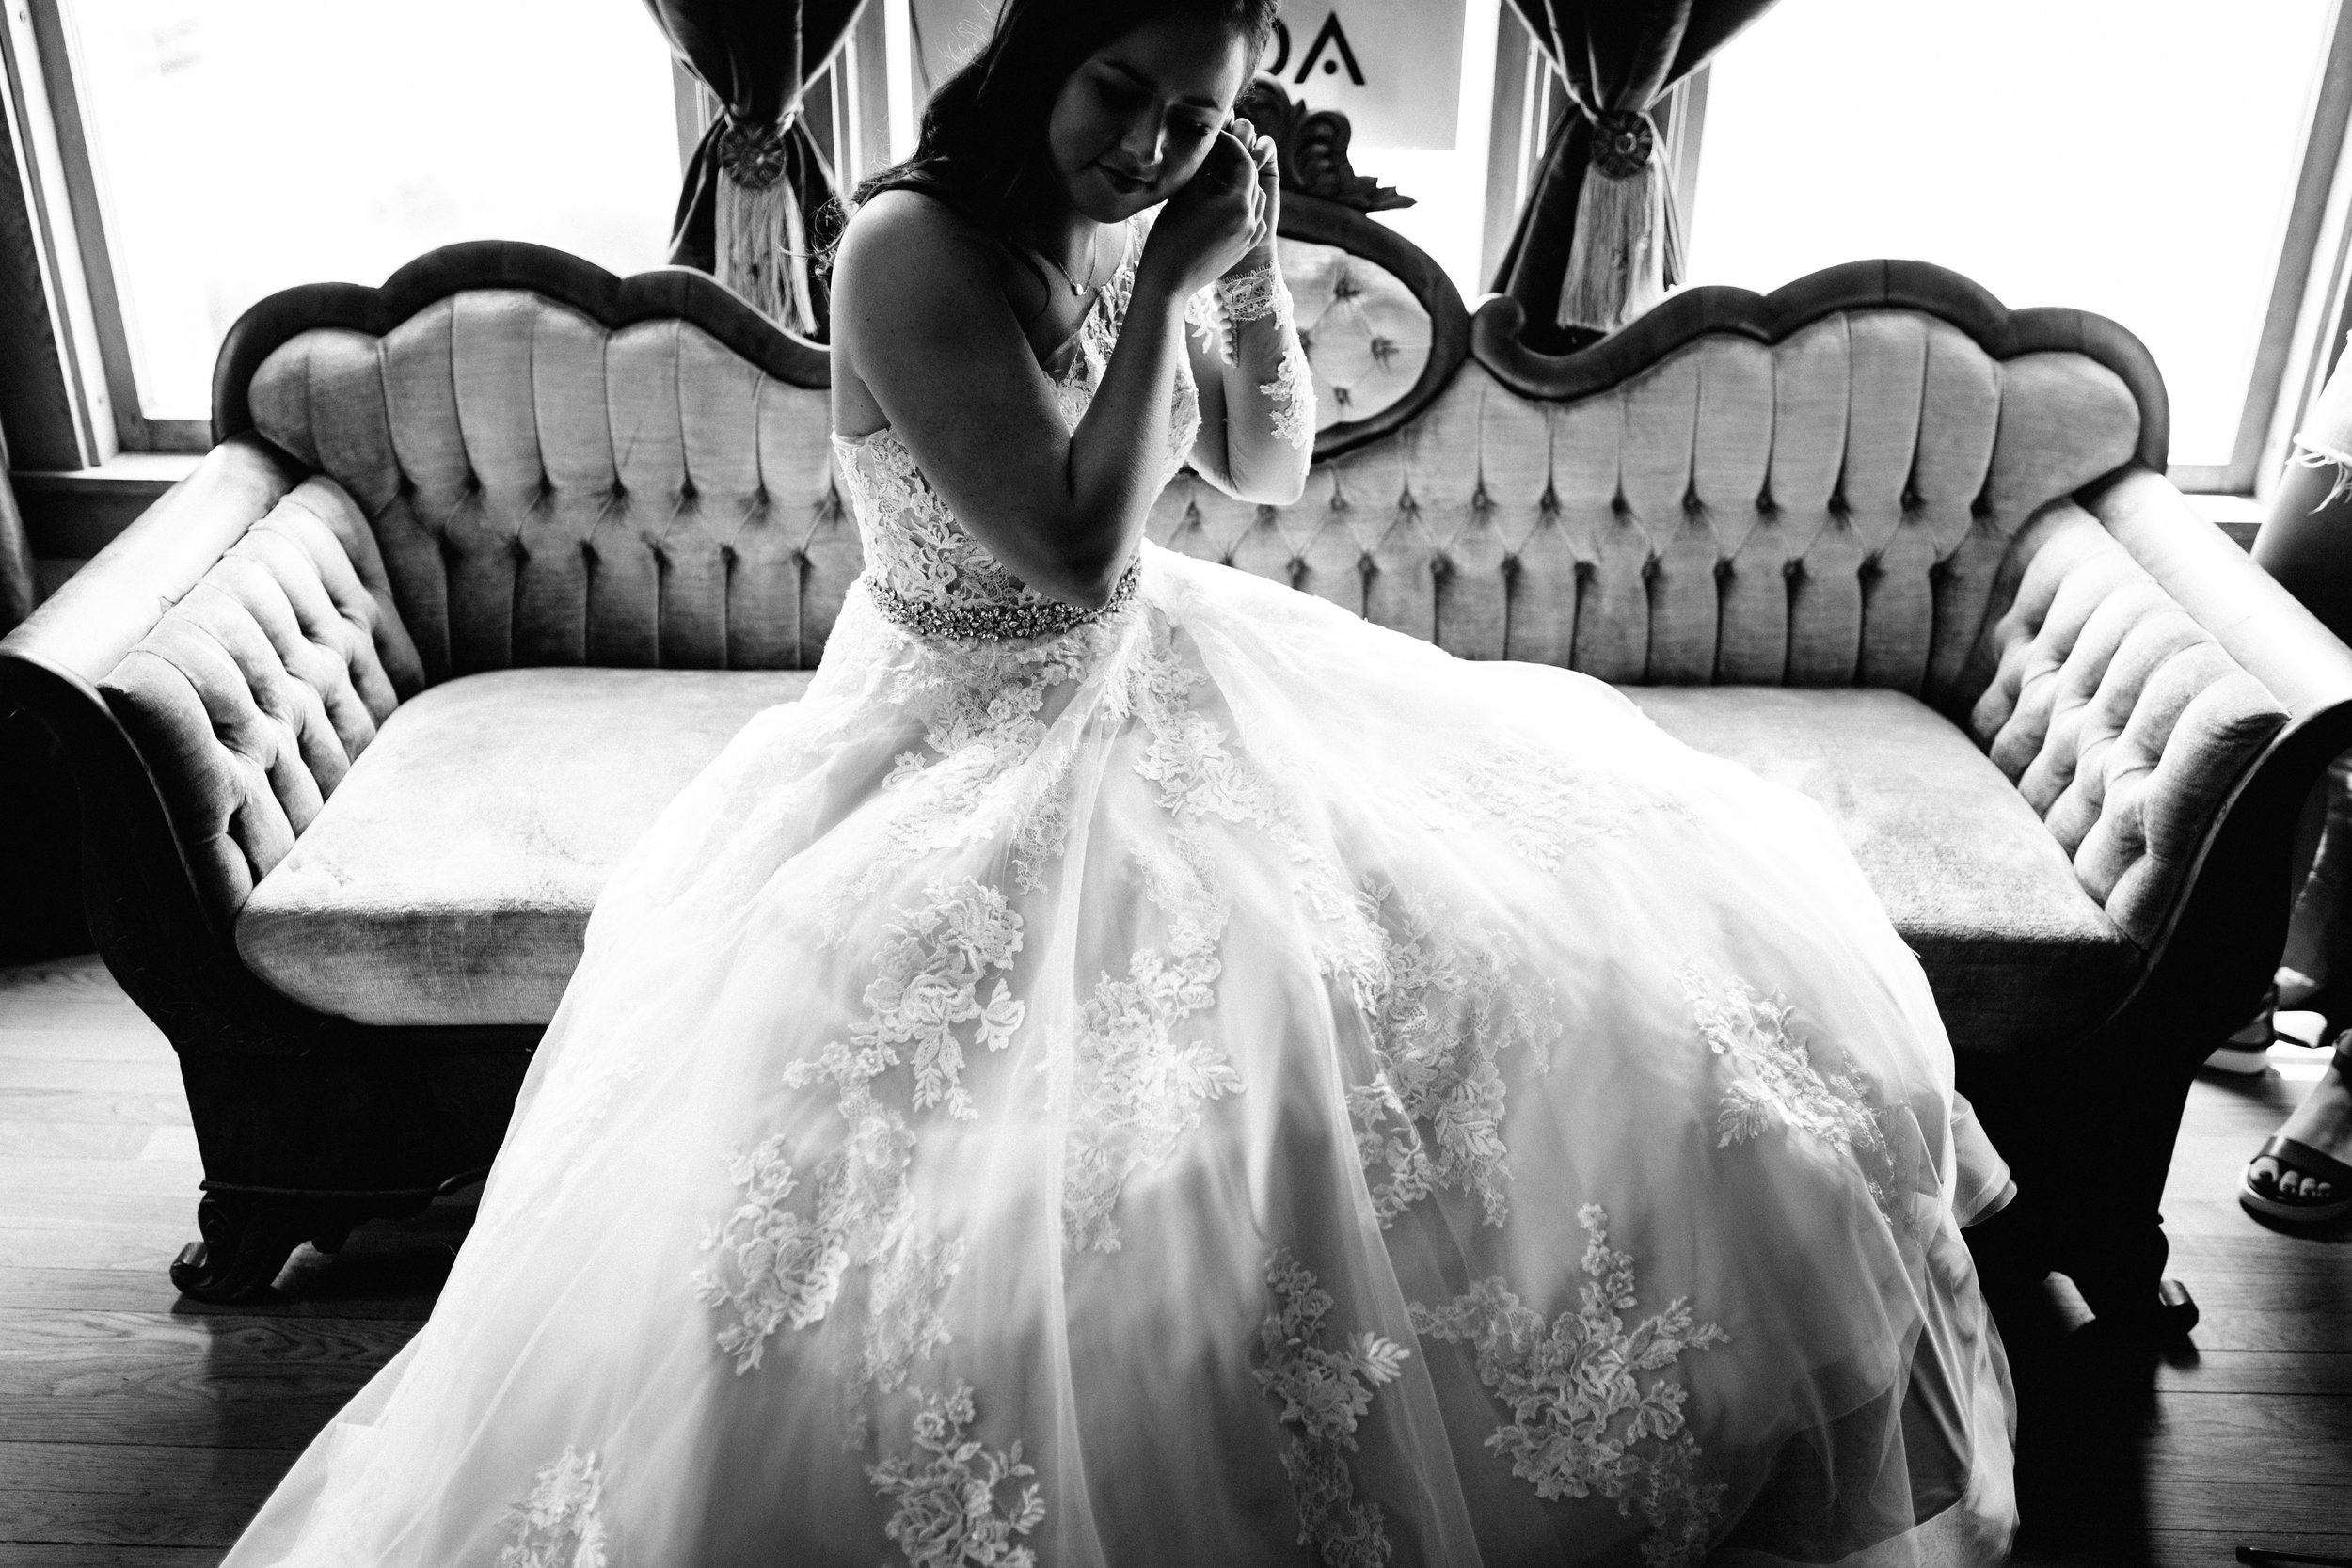 GRAYCENTOMHAMILTON-GRAND-RAPIDS-WEDDING-PHOTOGRAPHY-12.jpg